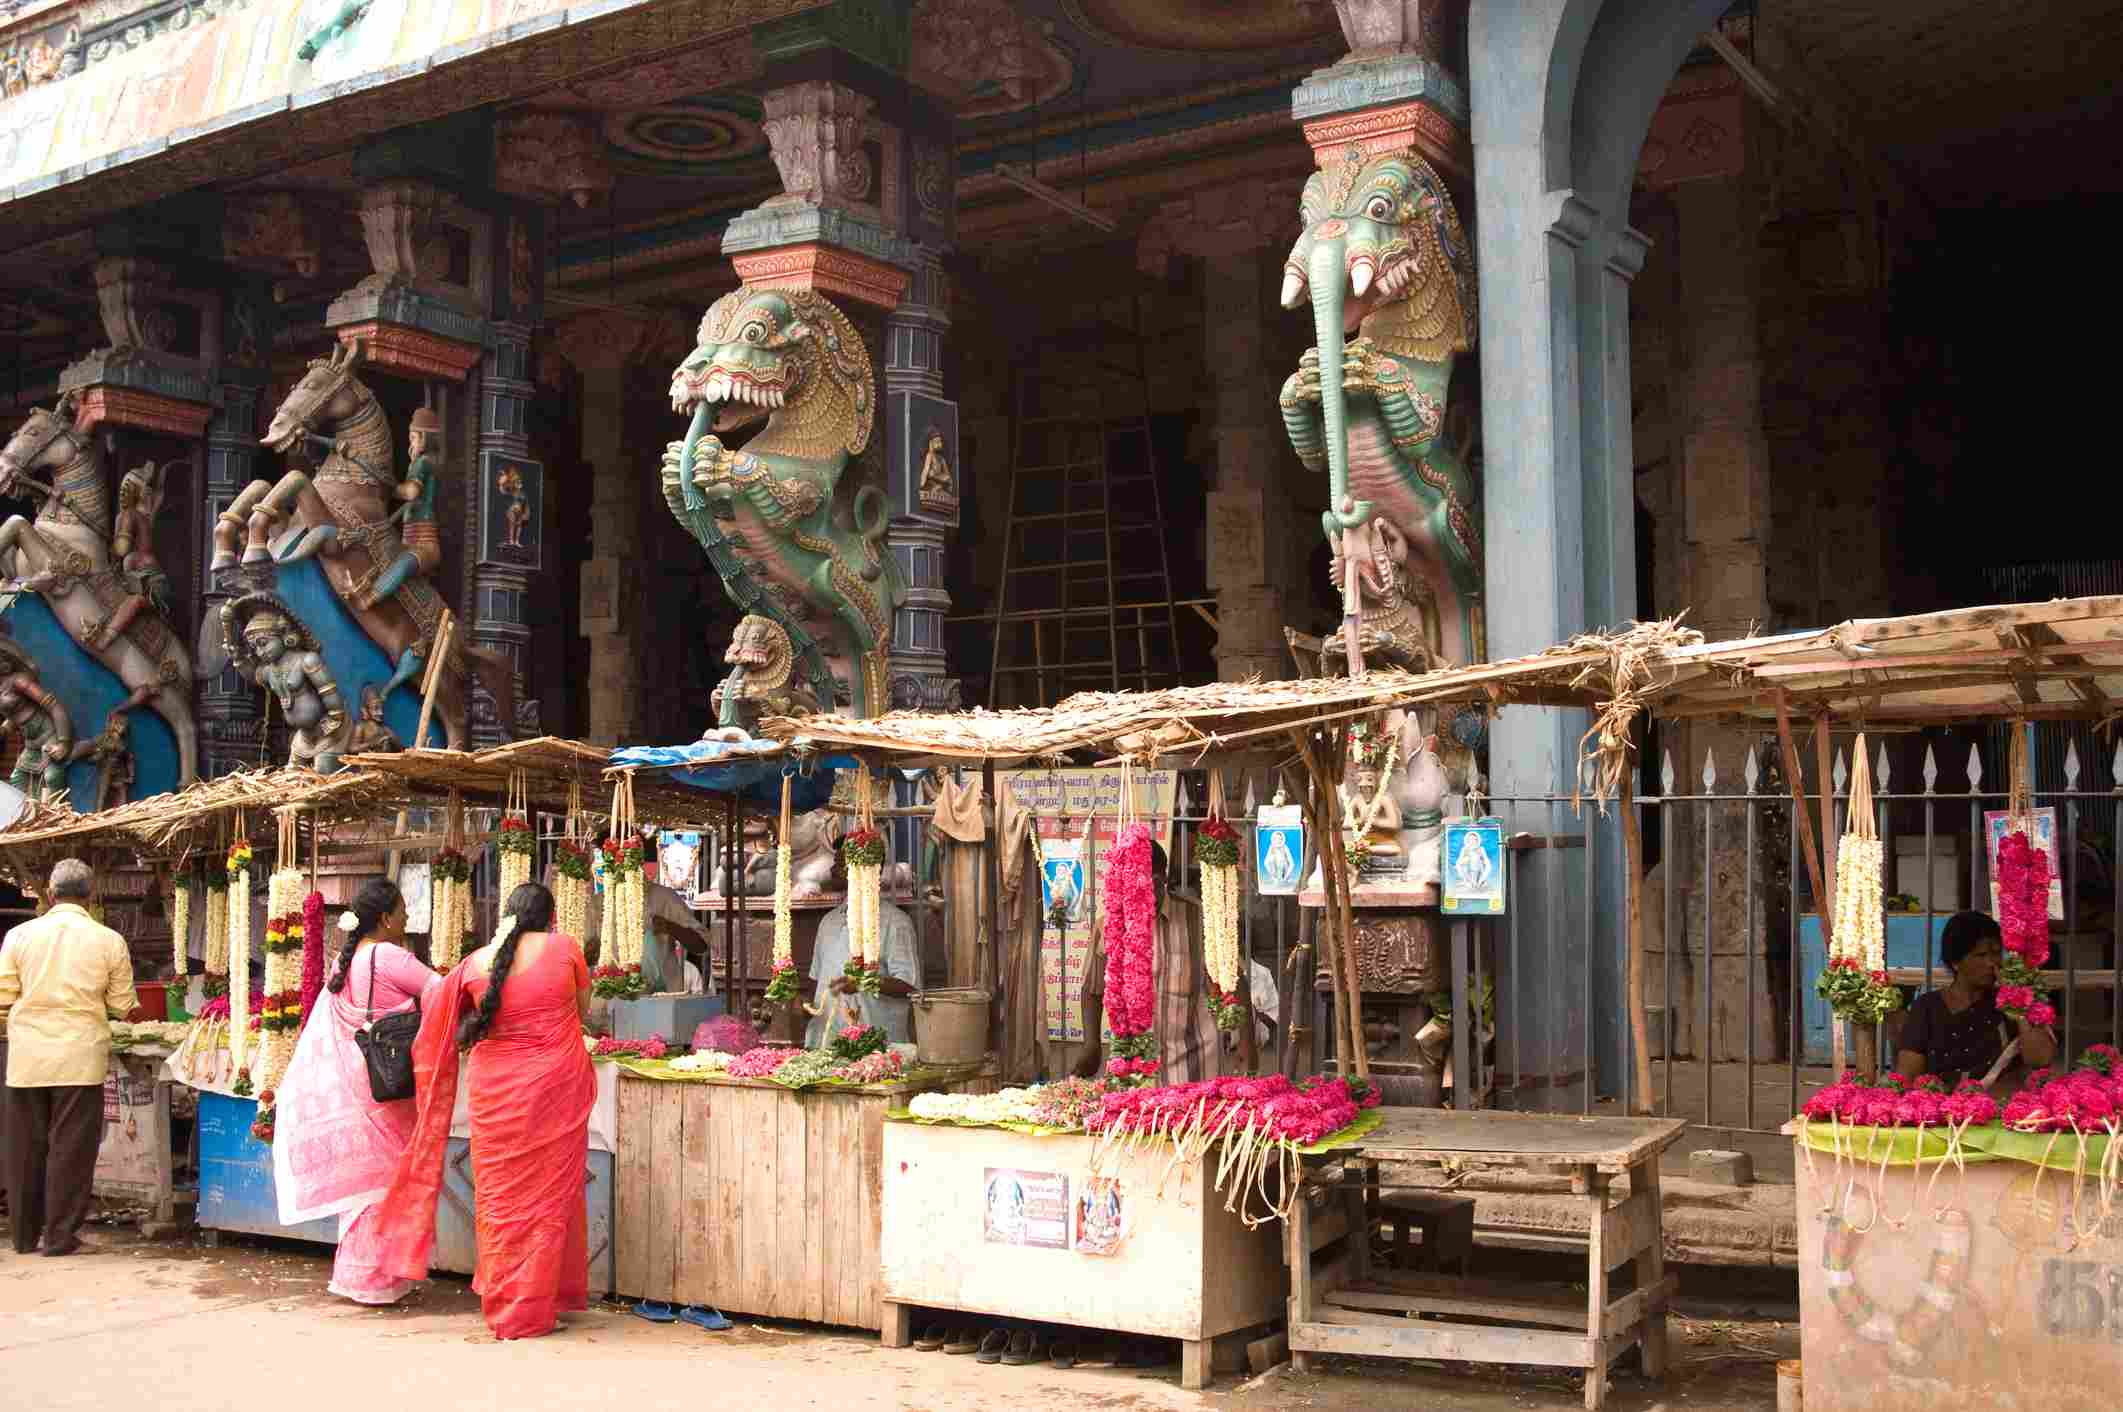 Thiruparankundram temple of kartikeya or murugan, Madurai, Tamil Nadu